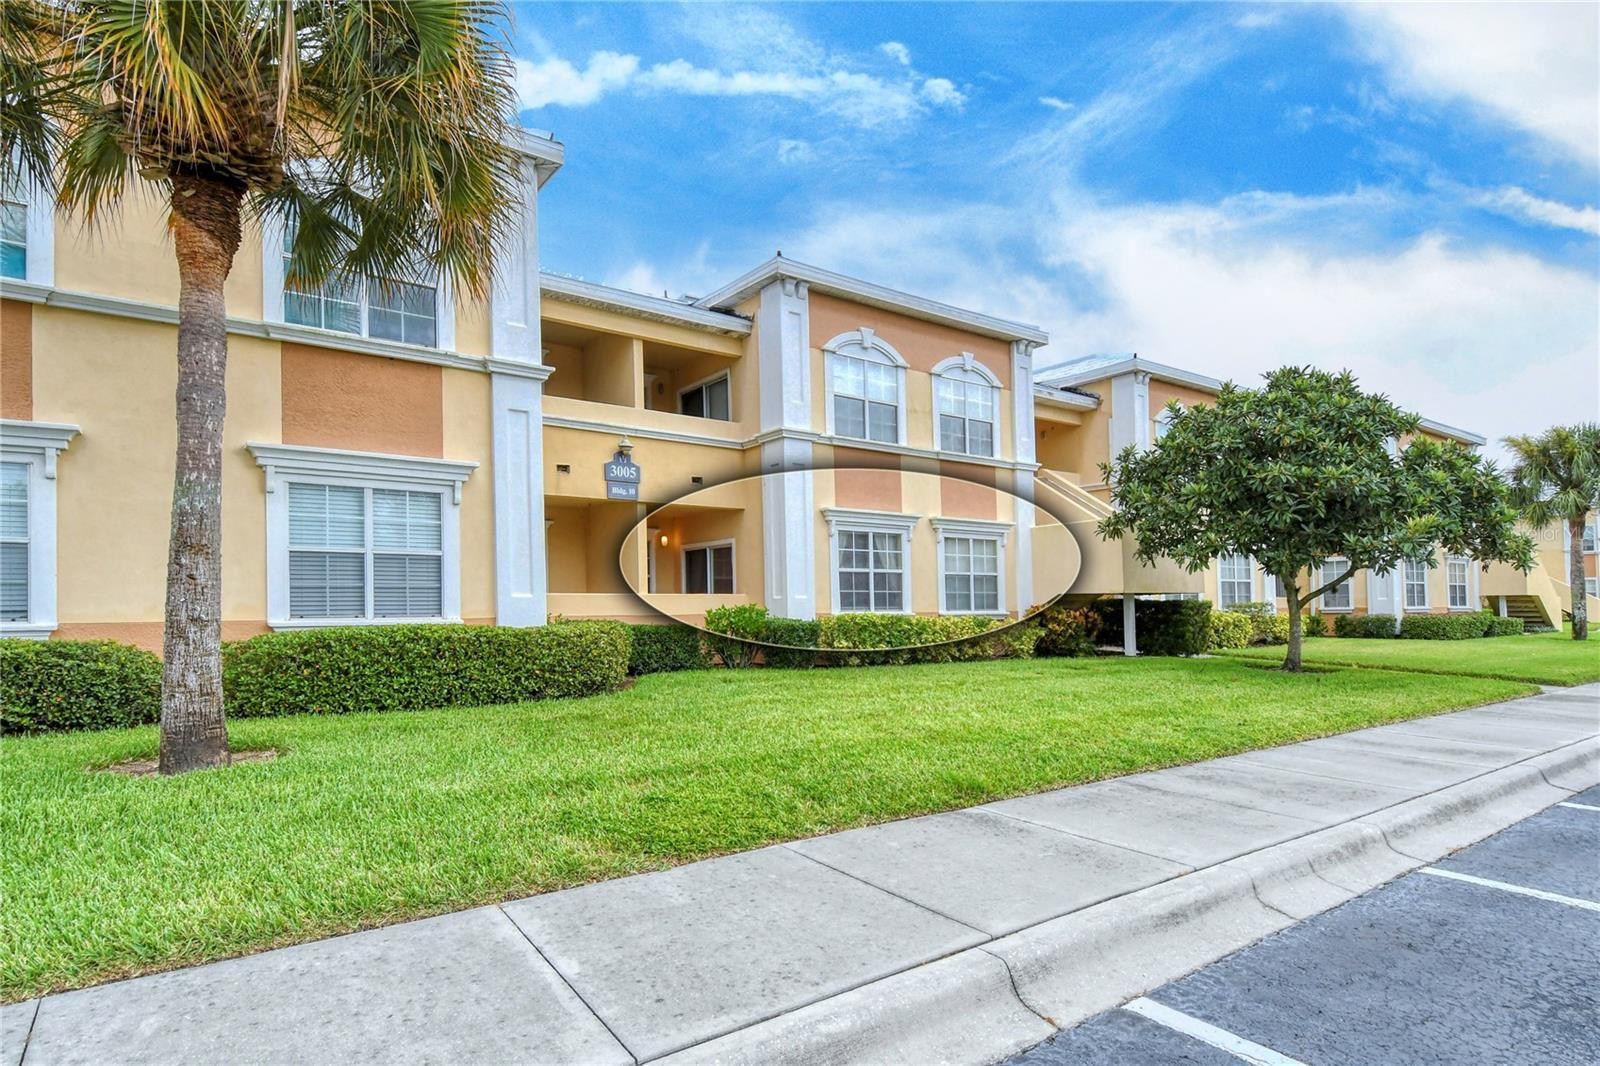 3005 CHIANTI COURT #102, Sarasota, FL 34237 - #: A4512616